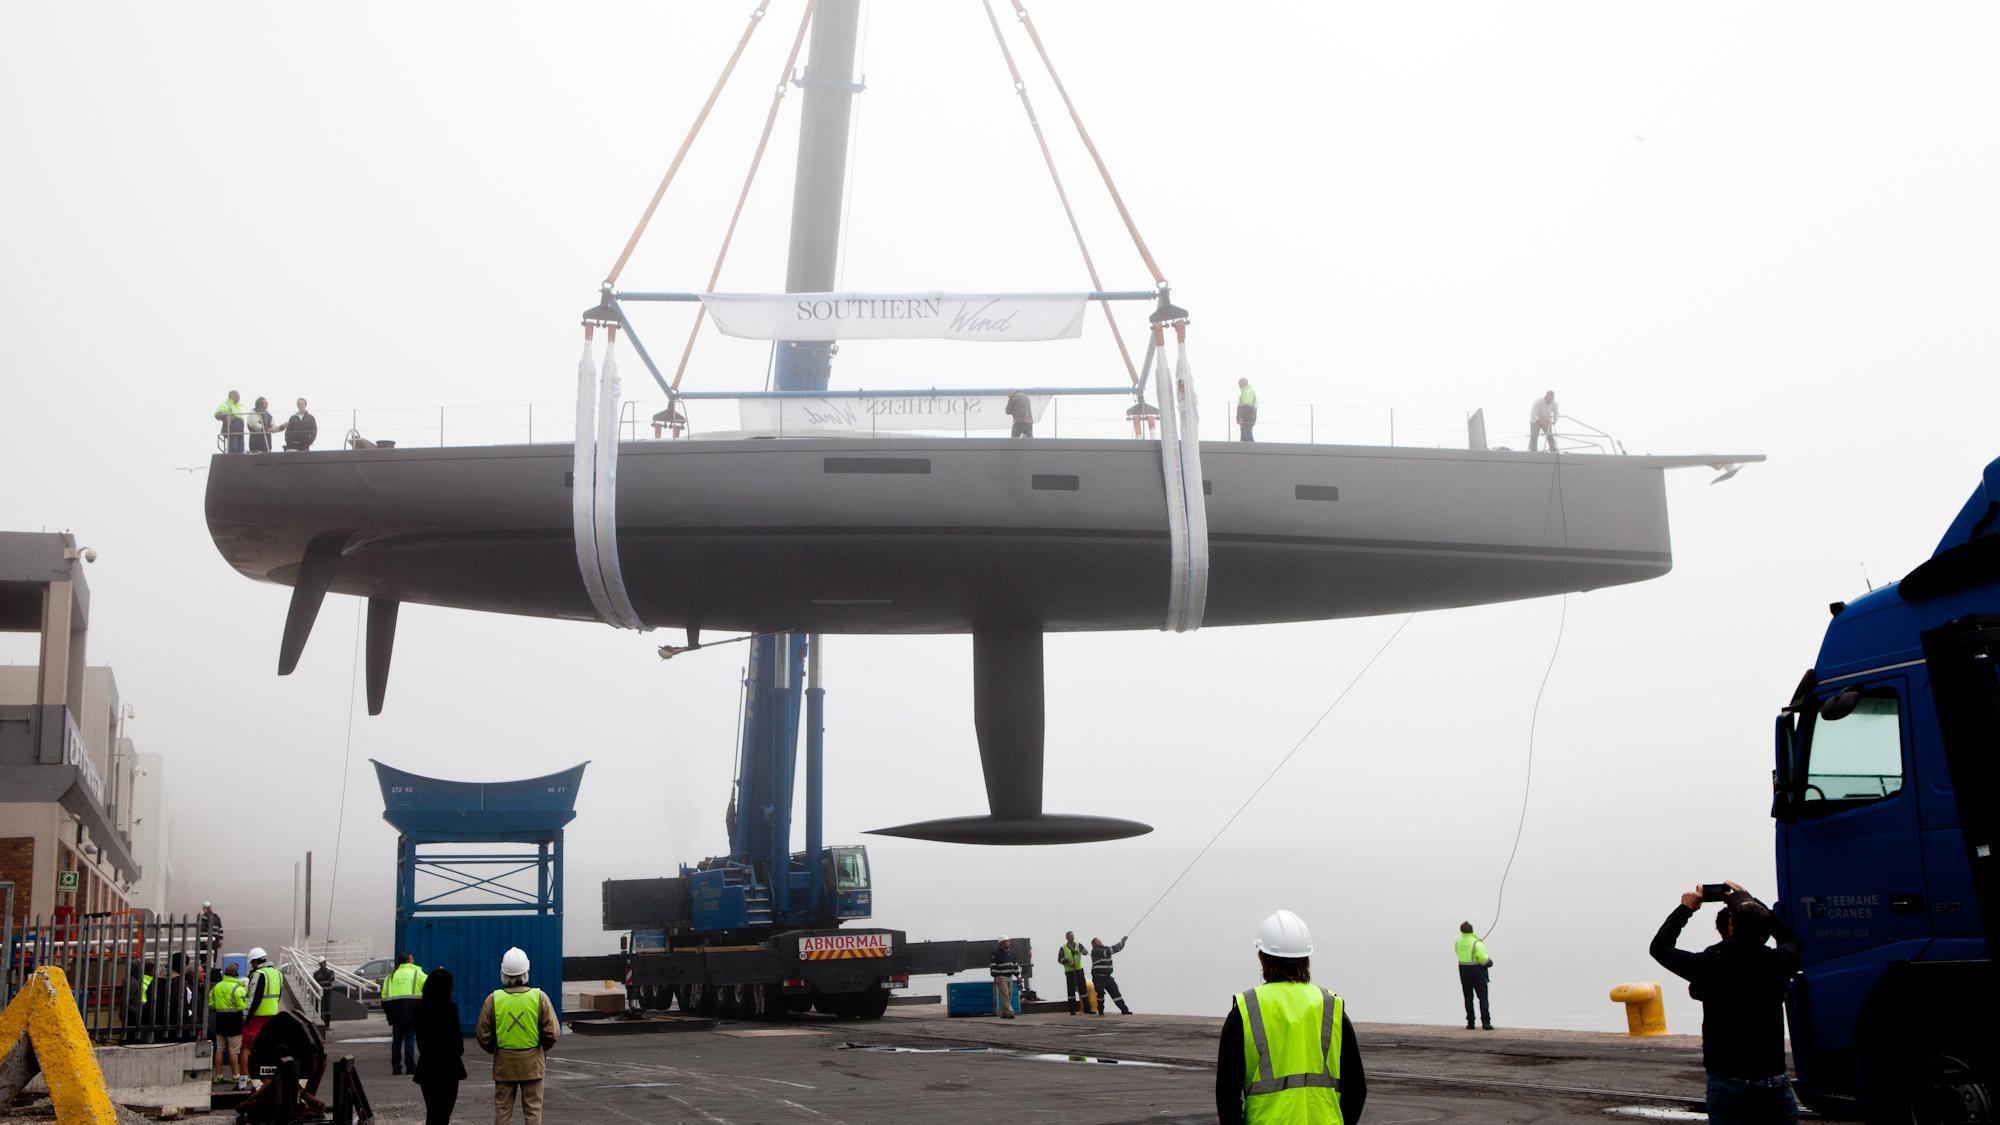 sorceress sailing yacht southern wind shipyard 96 29m 2017 launch profile